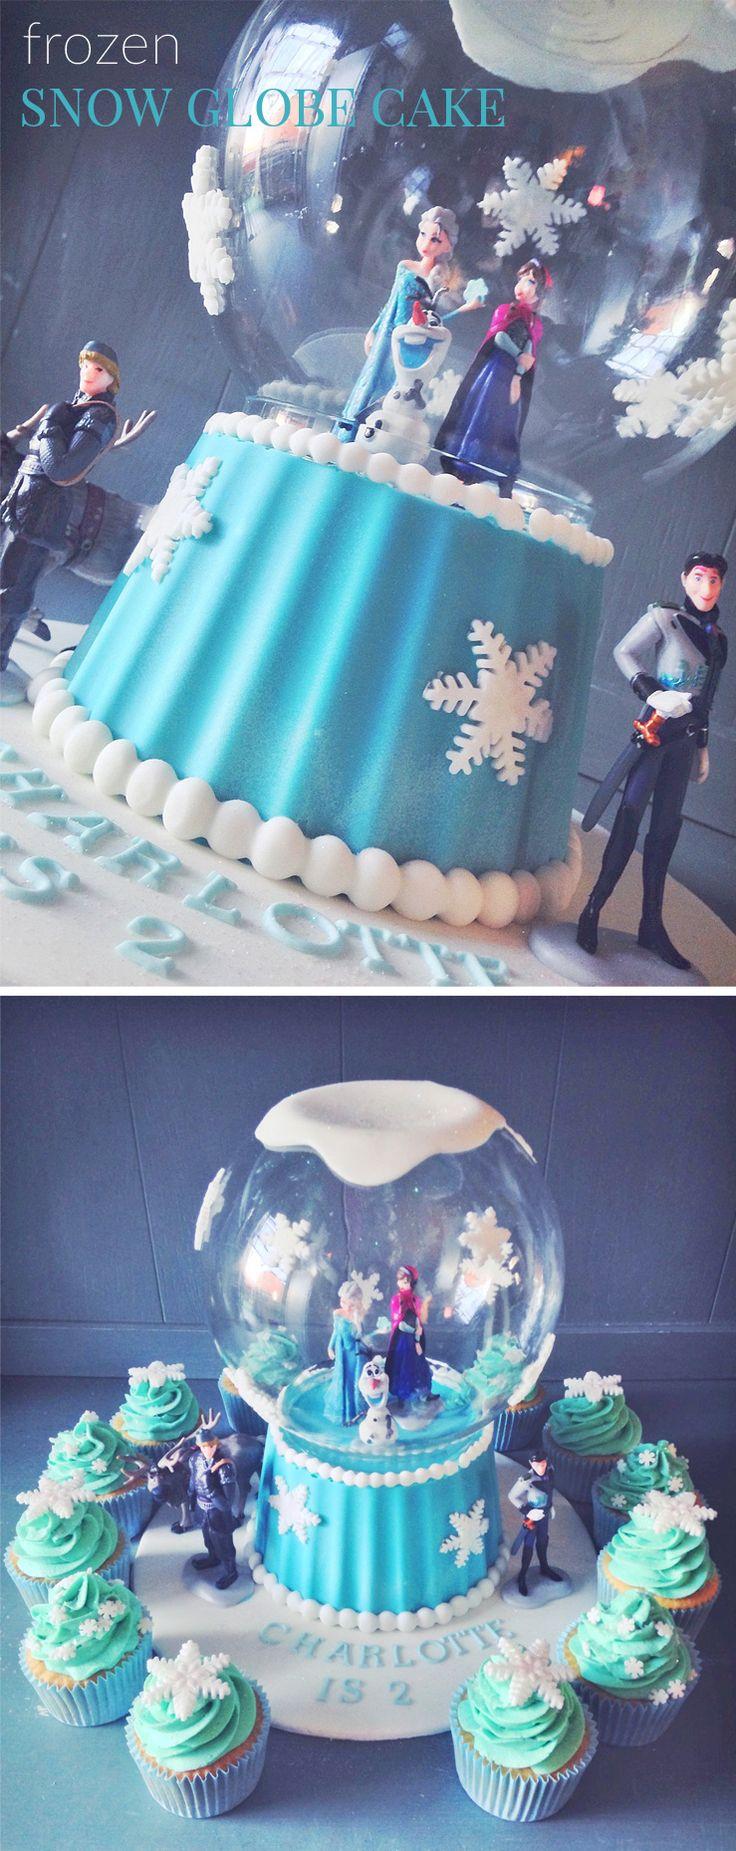 My Cakes | Hints & Tips to create a Frozen Snow Globe Cake - Gym Bunny Mummy @gymbunnymum